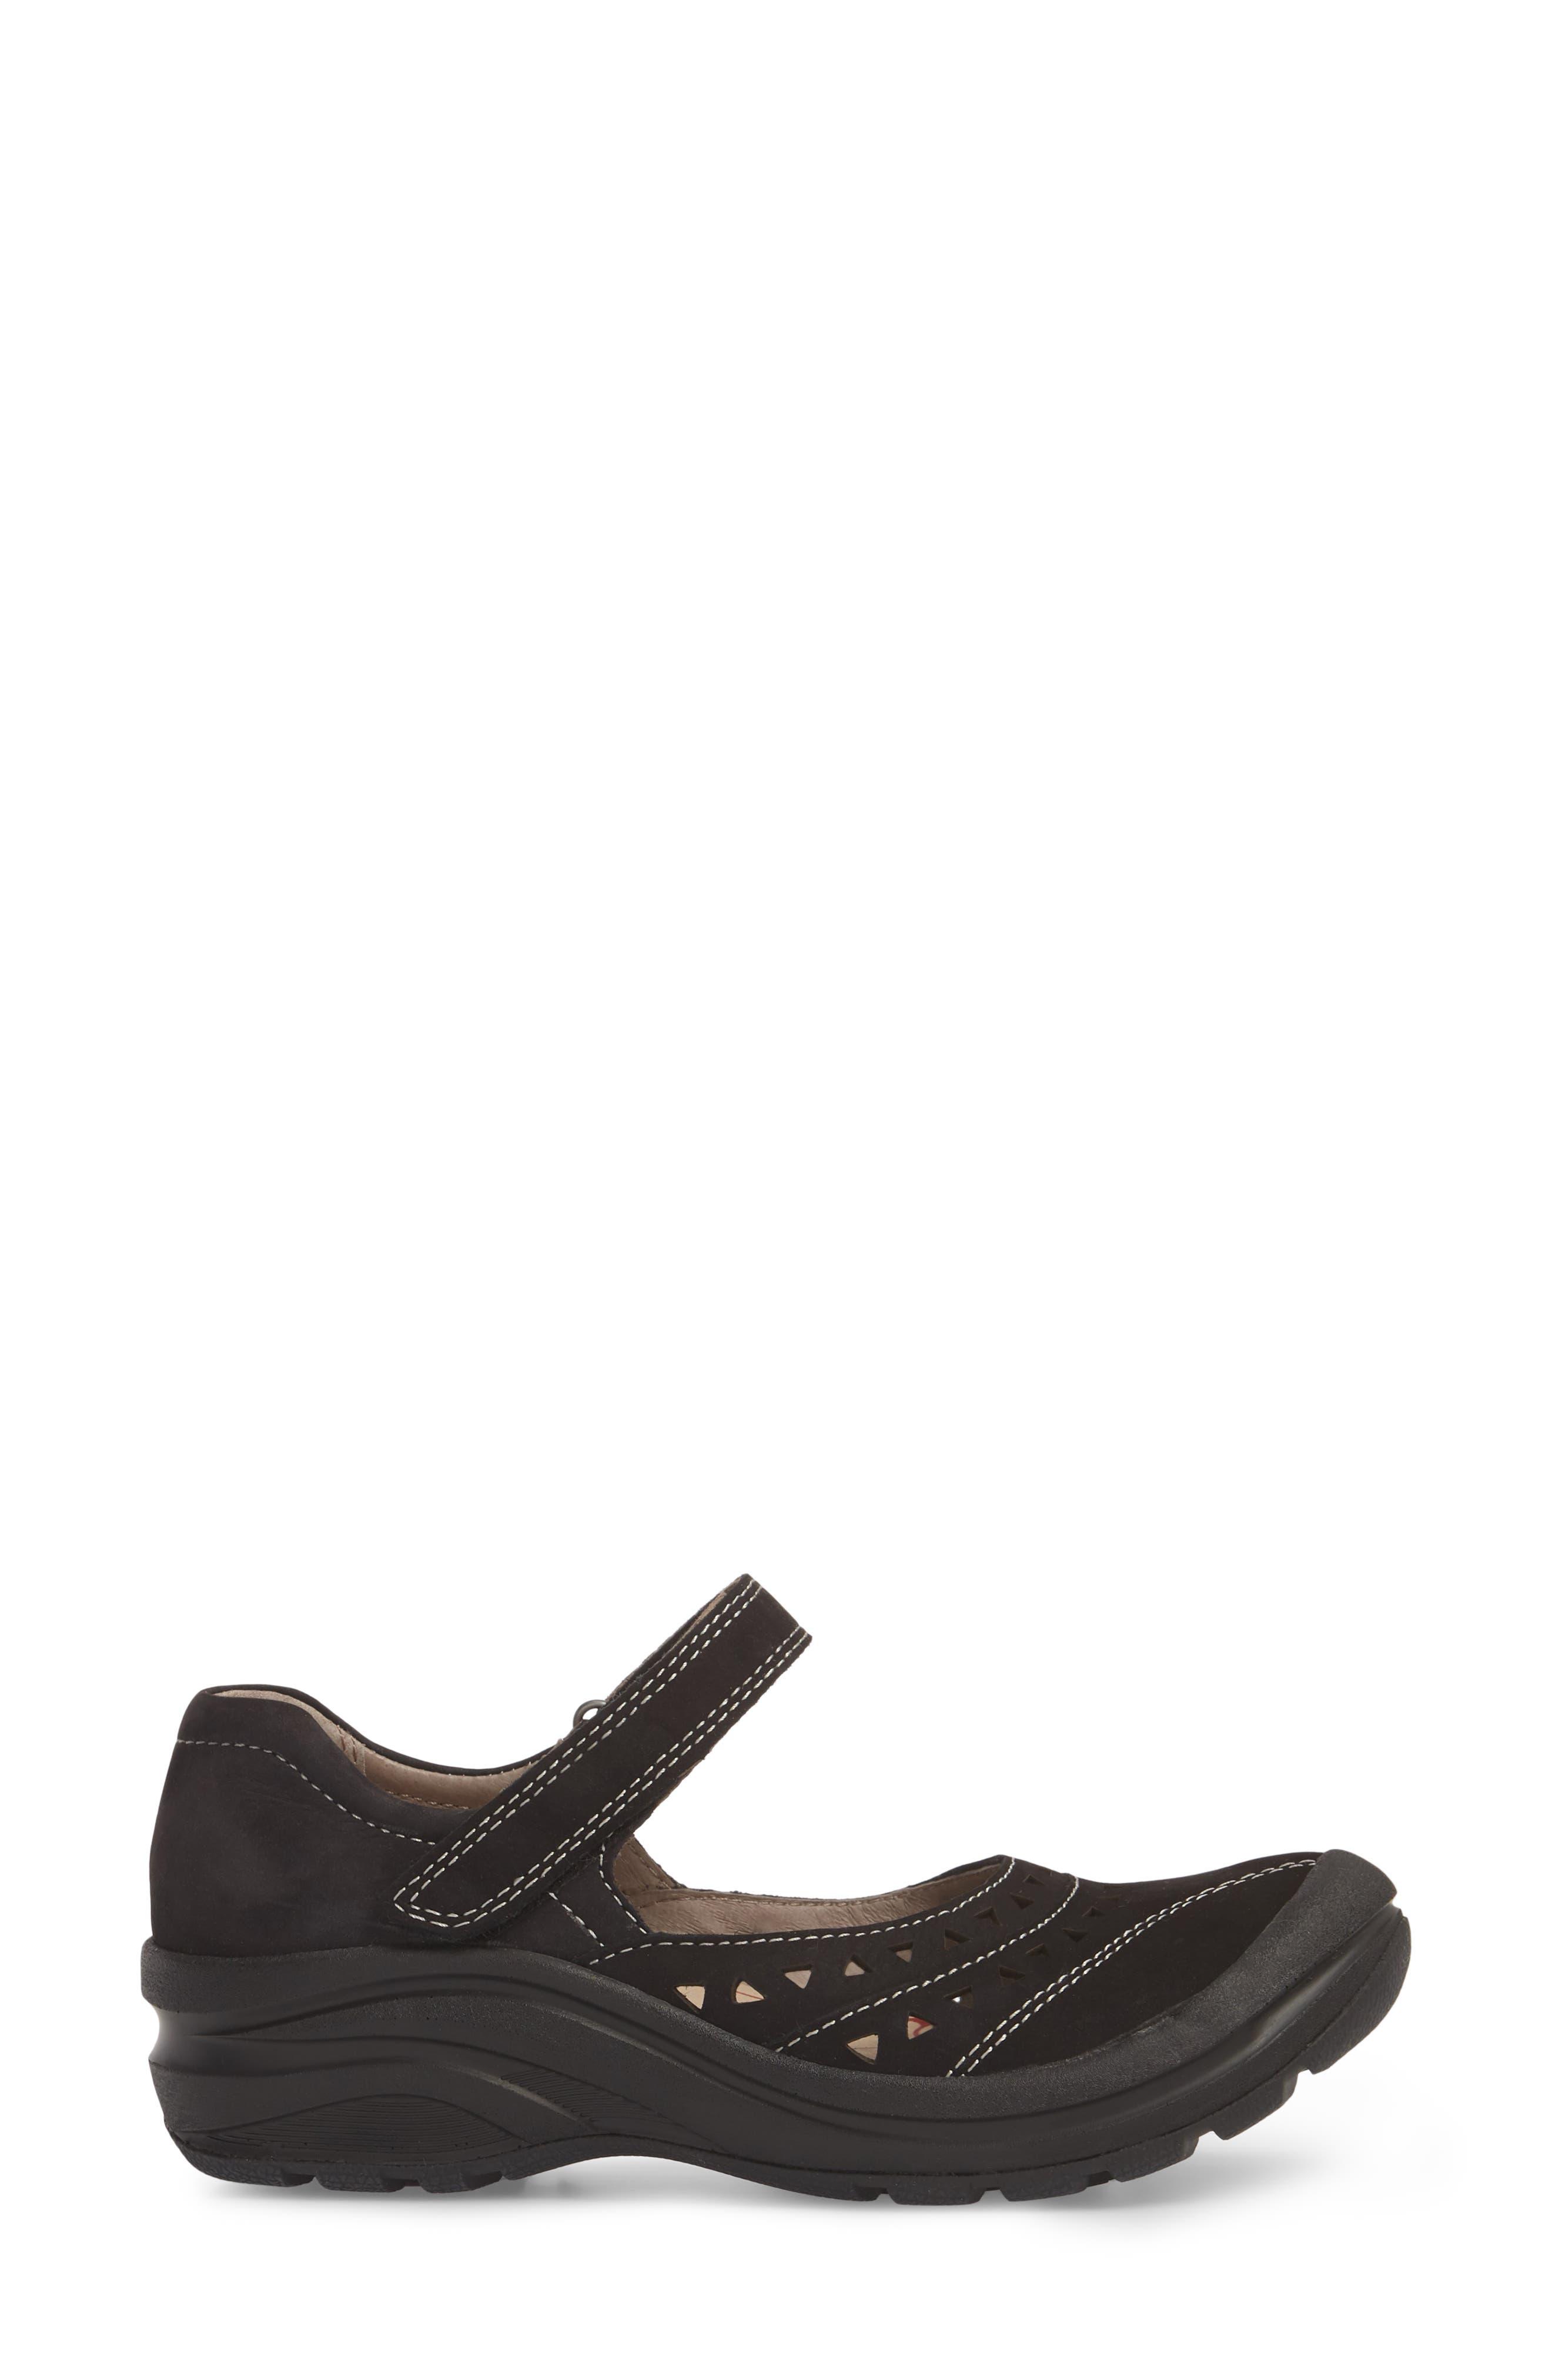 Matia Mary Jane Sneaker,                             Alternate thumbnail 3, color,                             BLACK LEATHER